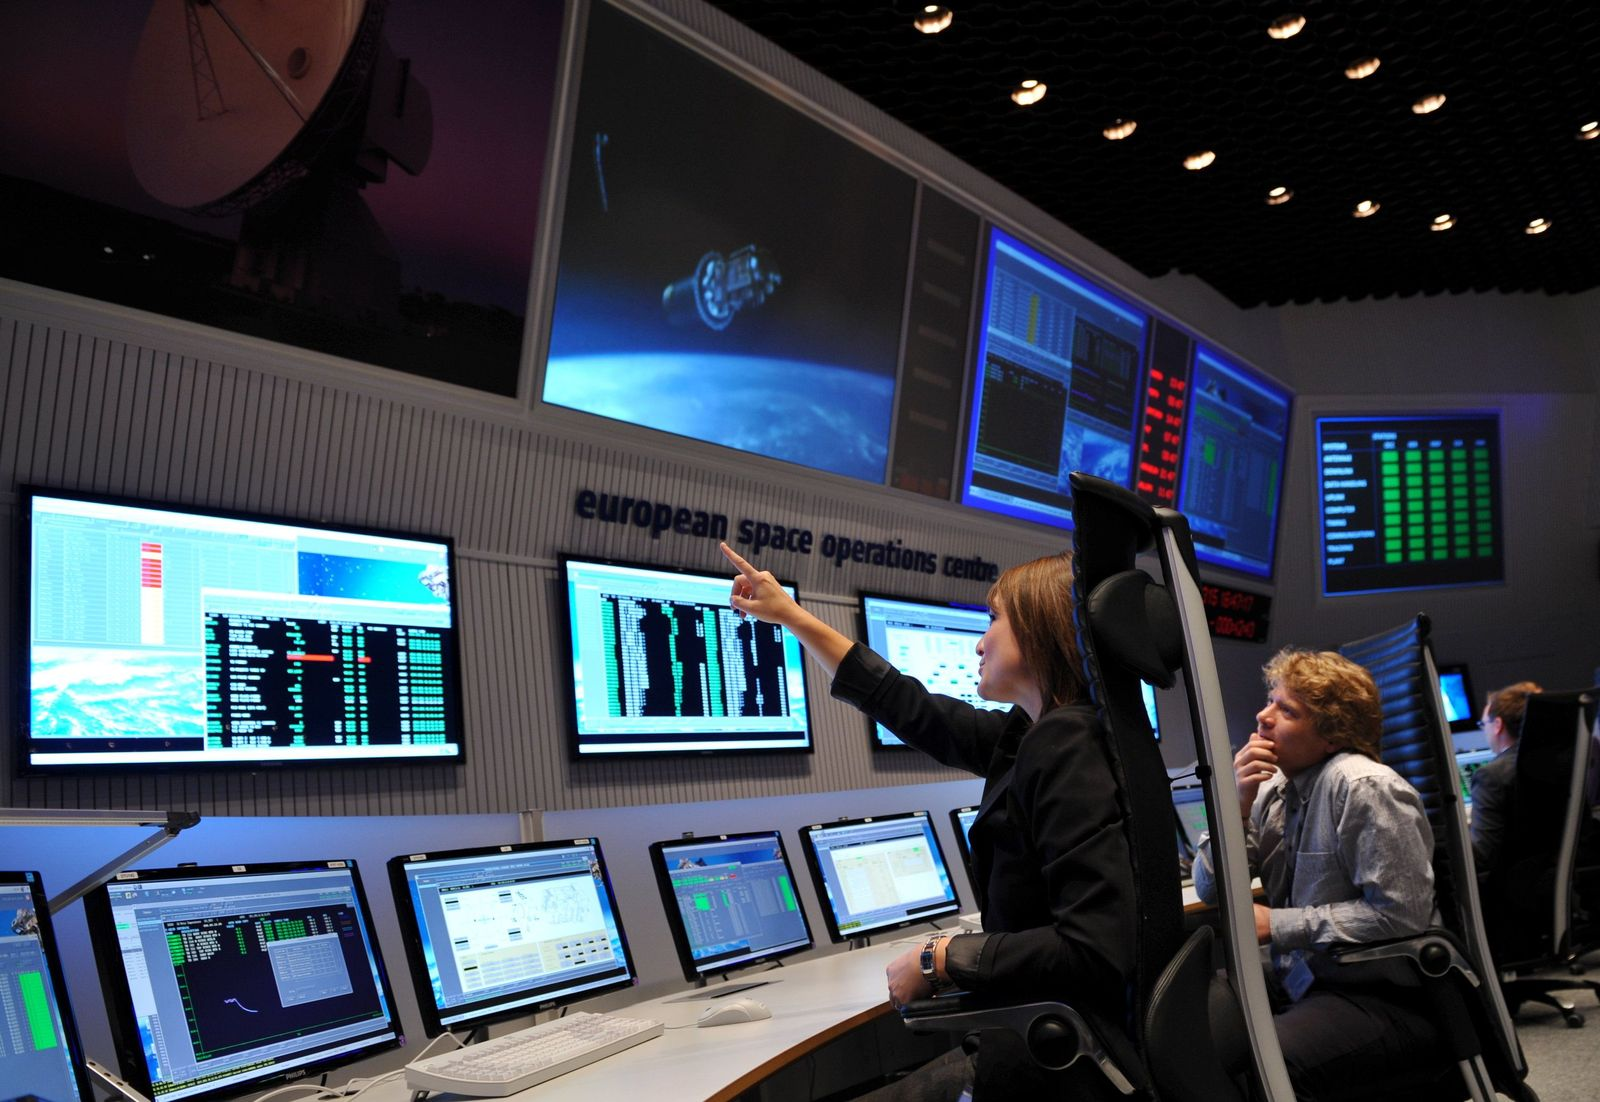 ESA / Marsmond-Sonde / Phobos-Grunt